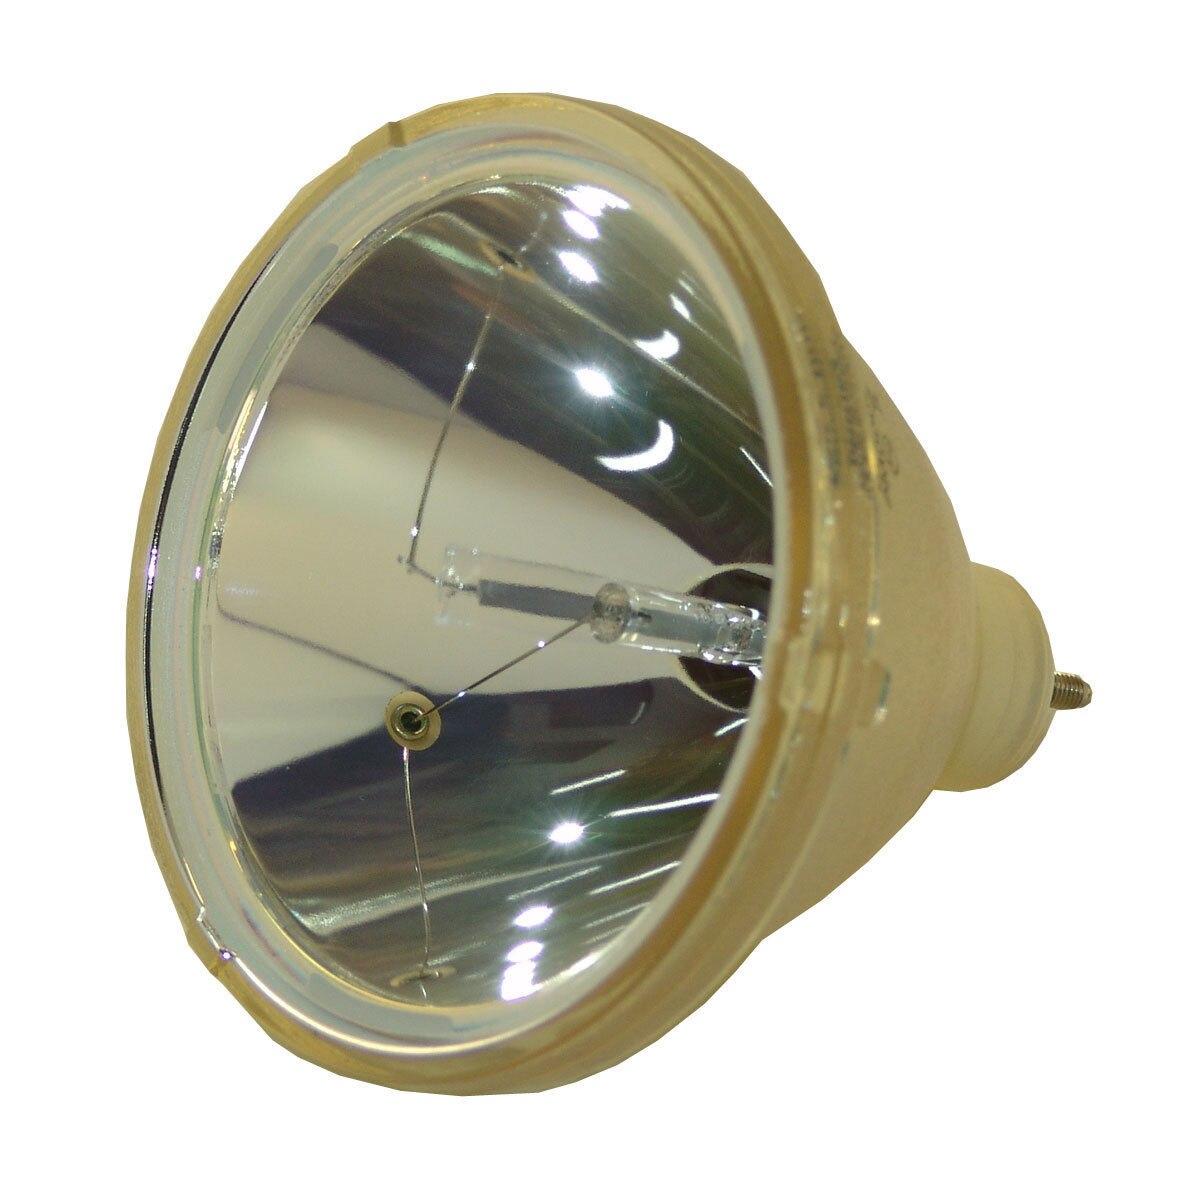 Compatible Bare Bulb BQC-XGP20X1 / BQC-XGP20X//1 for SHARP XG-P20 / XG-P20XD Projector Lamp Bulbs without housing free shipping free shipping compatible bare projector lamp an ph50lp2 for sharp xg ph50x